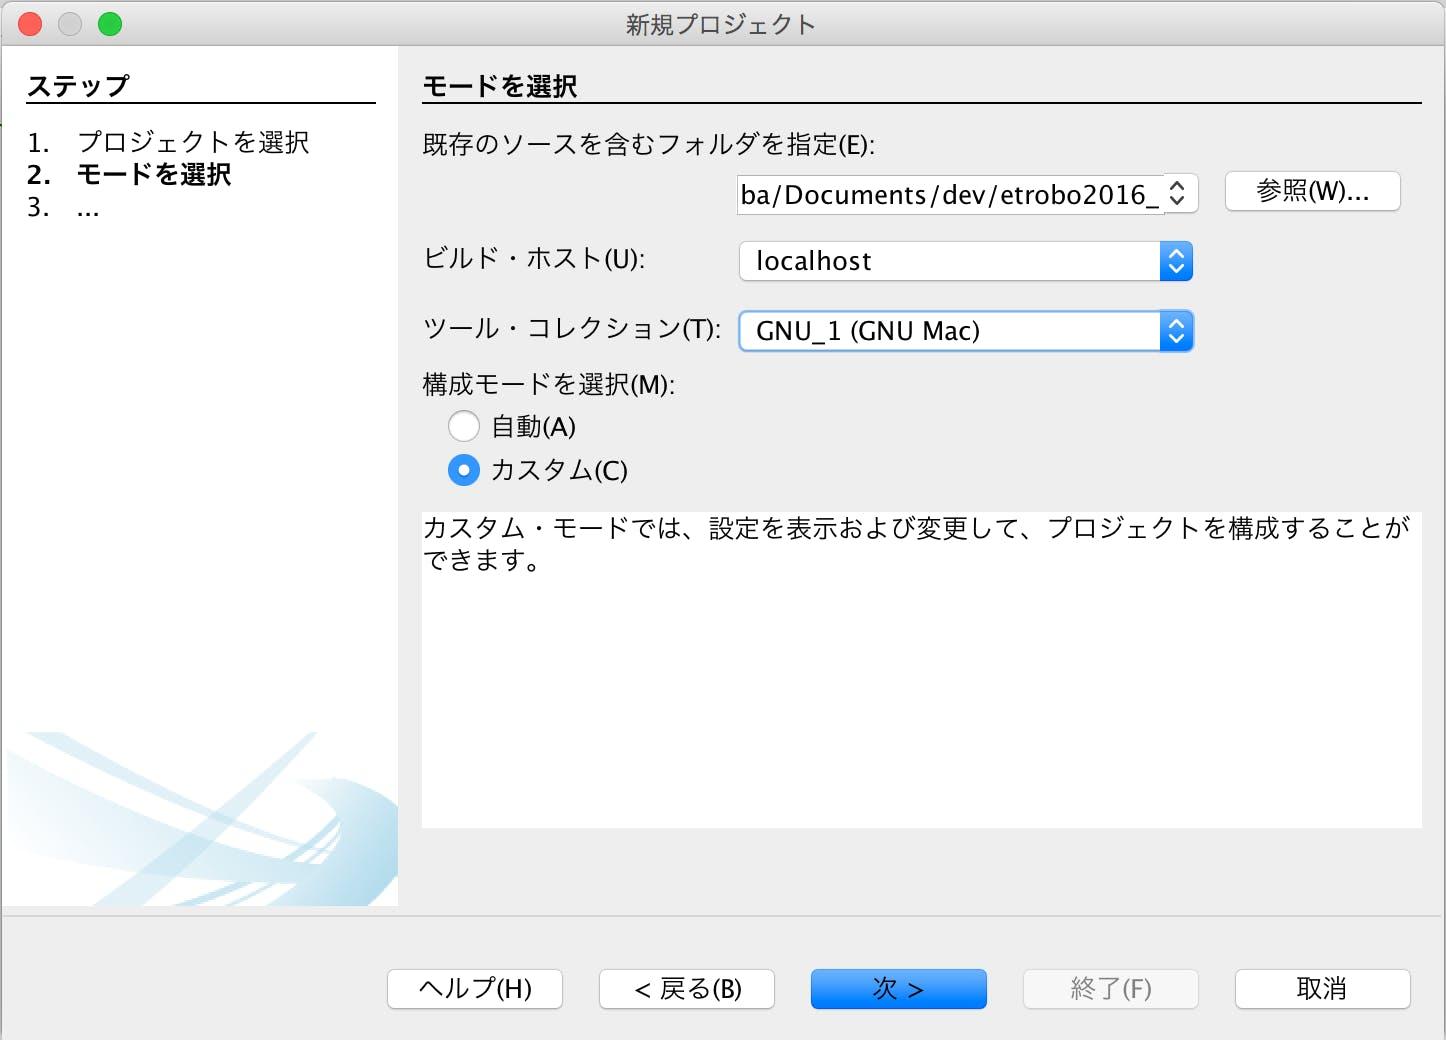 Mac / NetBeans で C/C++ TOPPERS/EV3RT の環境を構築する - Qiita